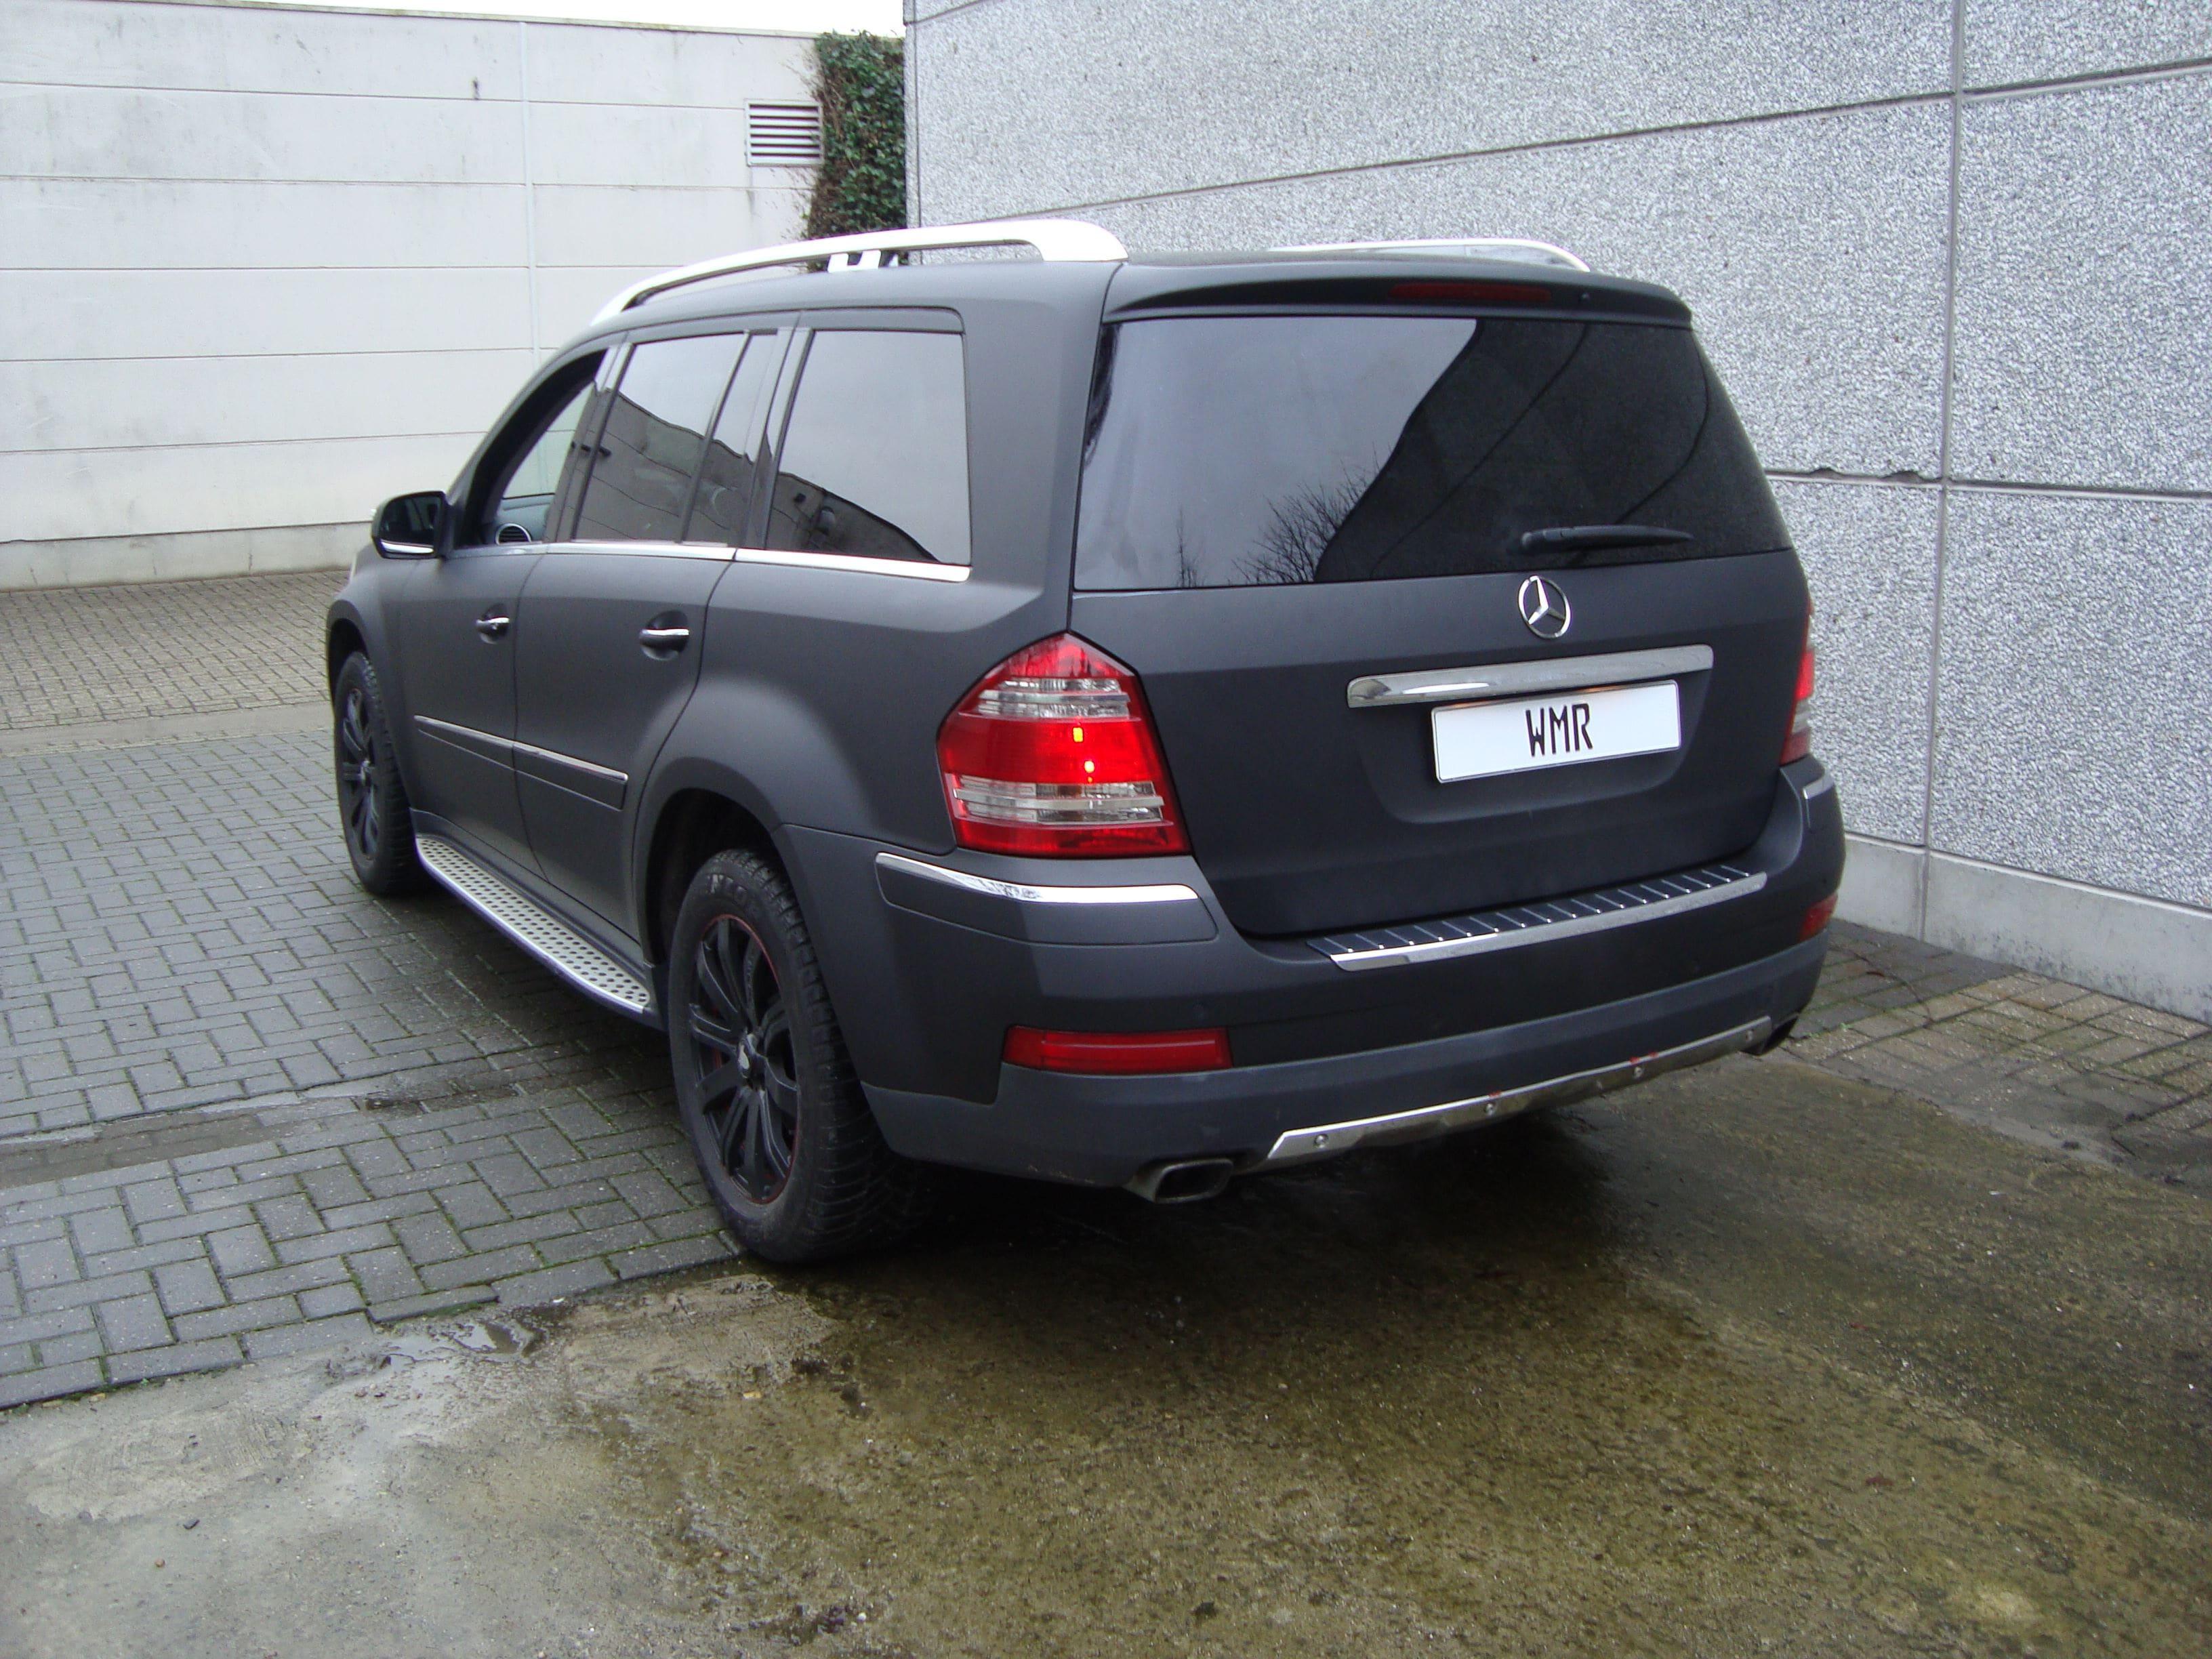 Mercedes GL met Mat Zwarte Wrap, Carwrapping door Wrapmyride.nu Foto-nr:6293, ©2020